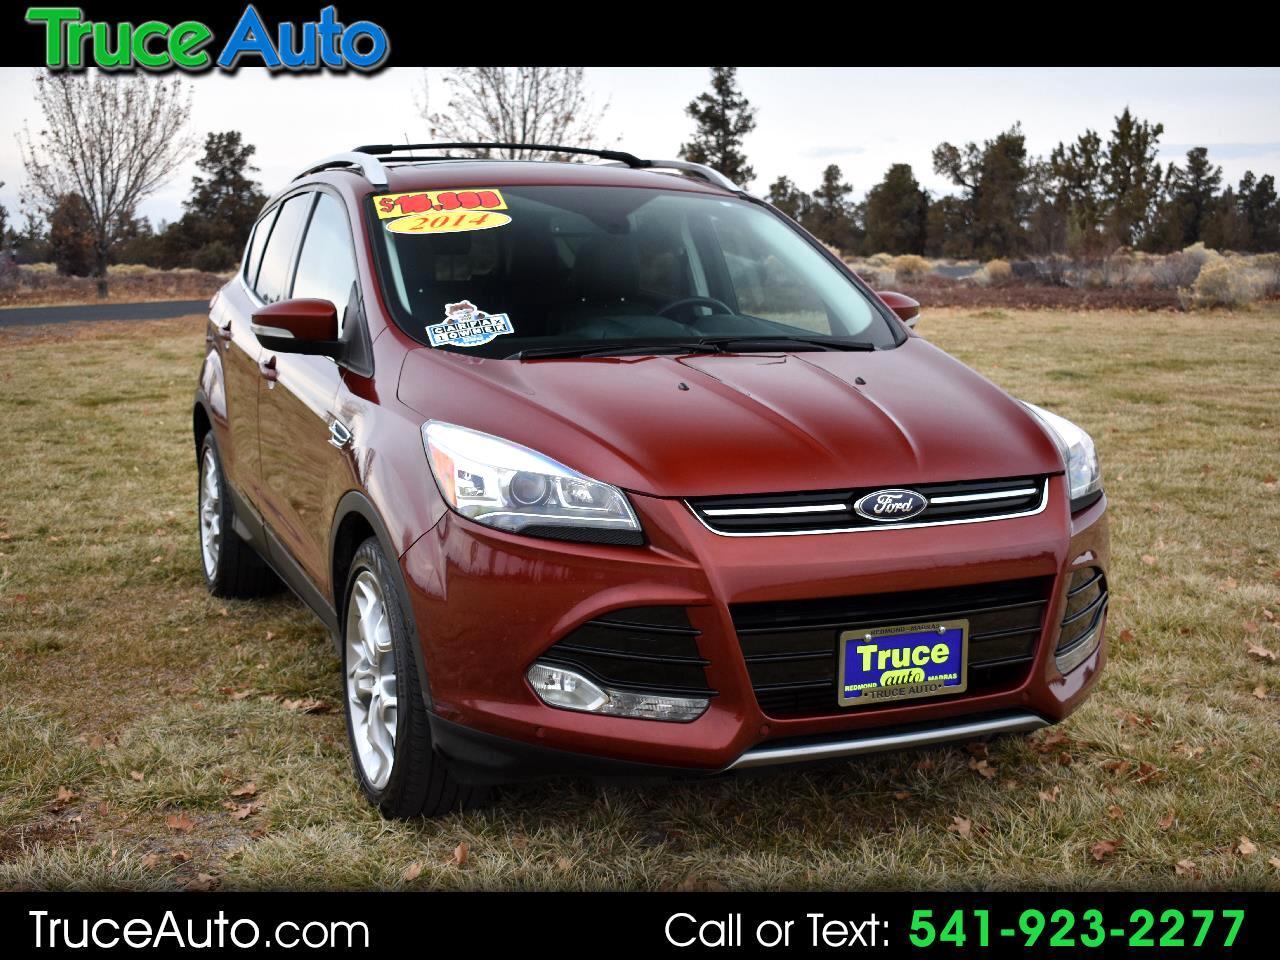 2014 Ford Escape Titanium 4WD 4dr ****ONE OWNER***